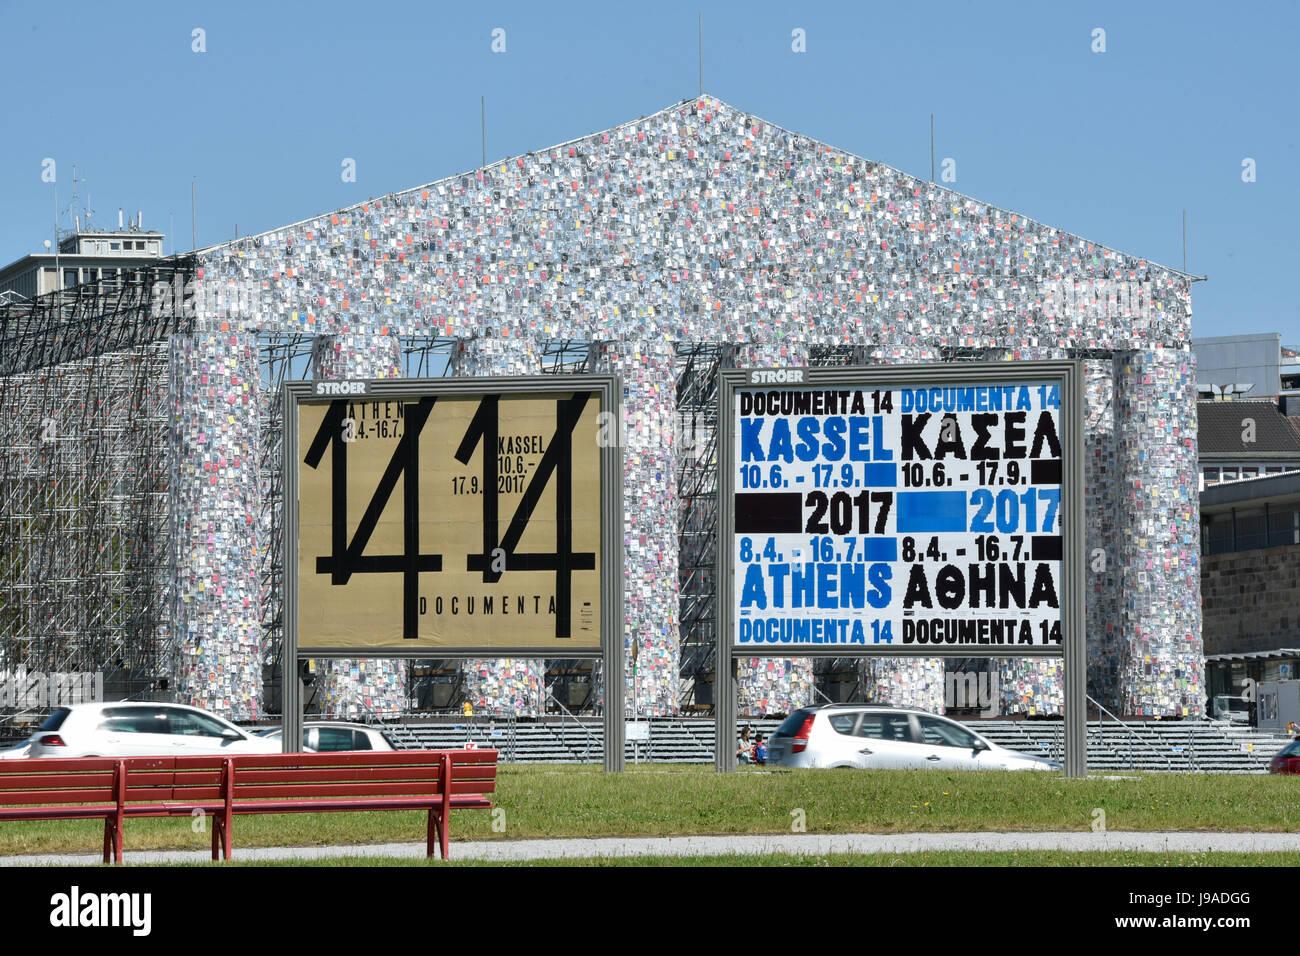 Kassel germany 1st june 2017 documenta signs in front for Documenta kassel 2017